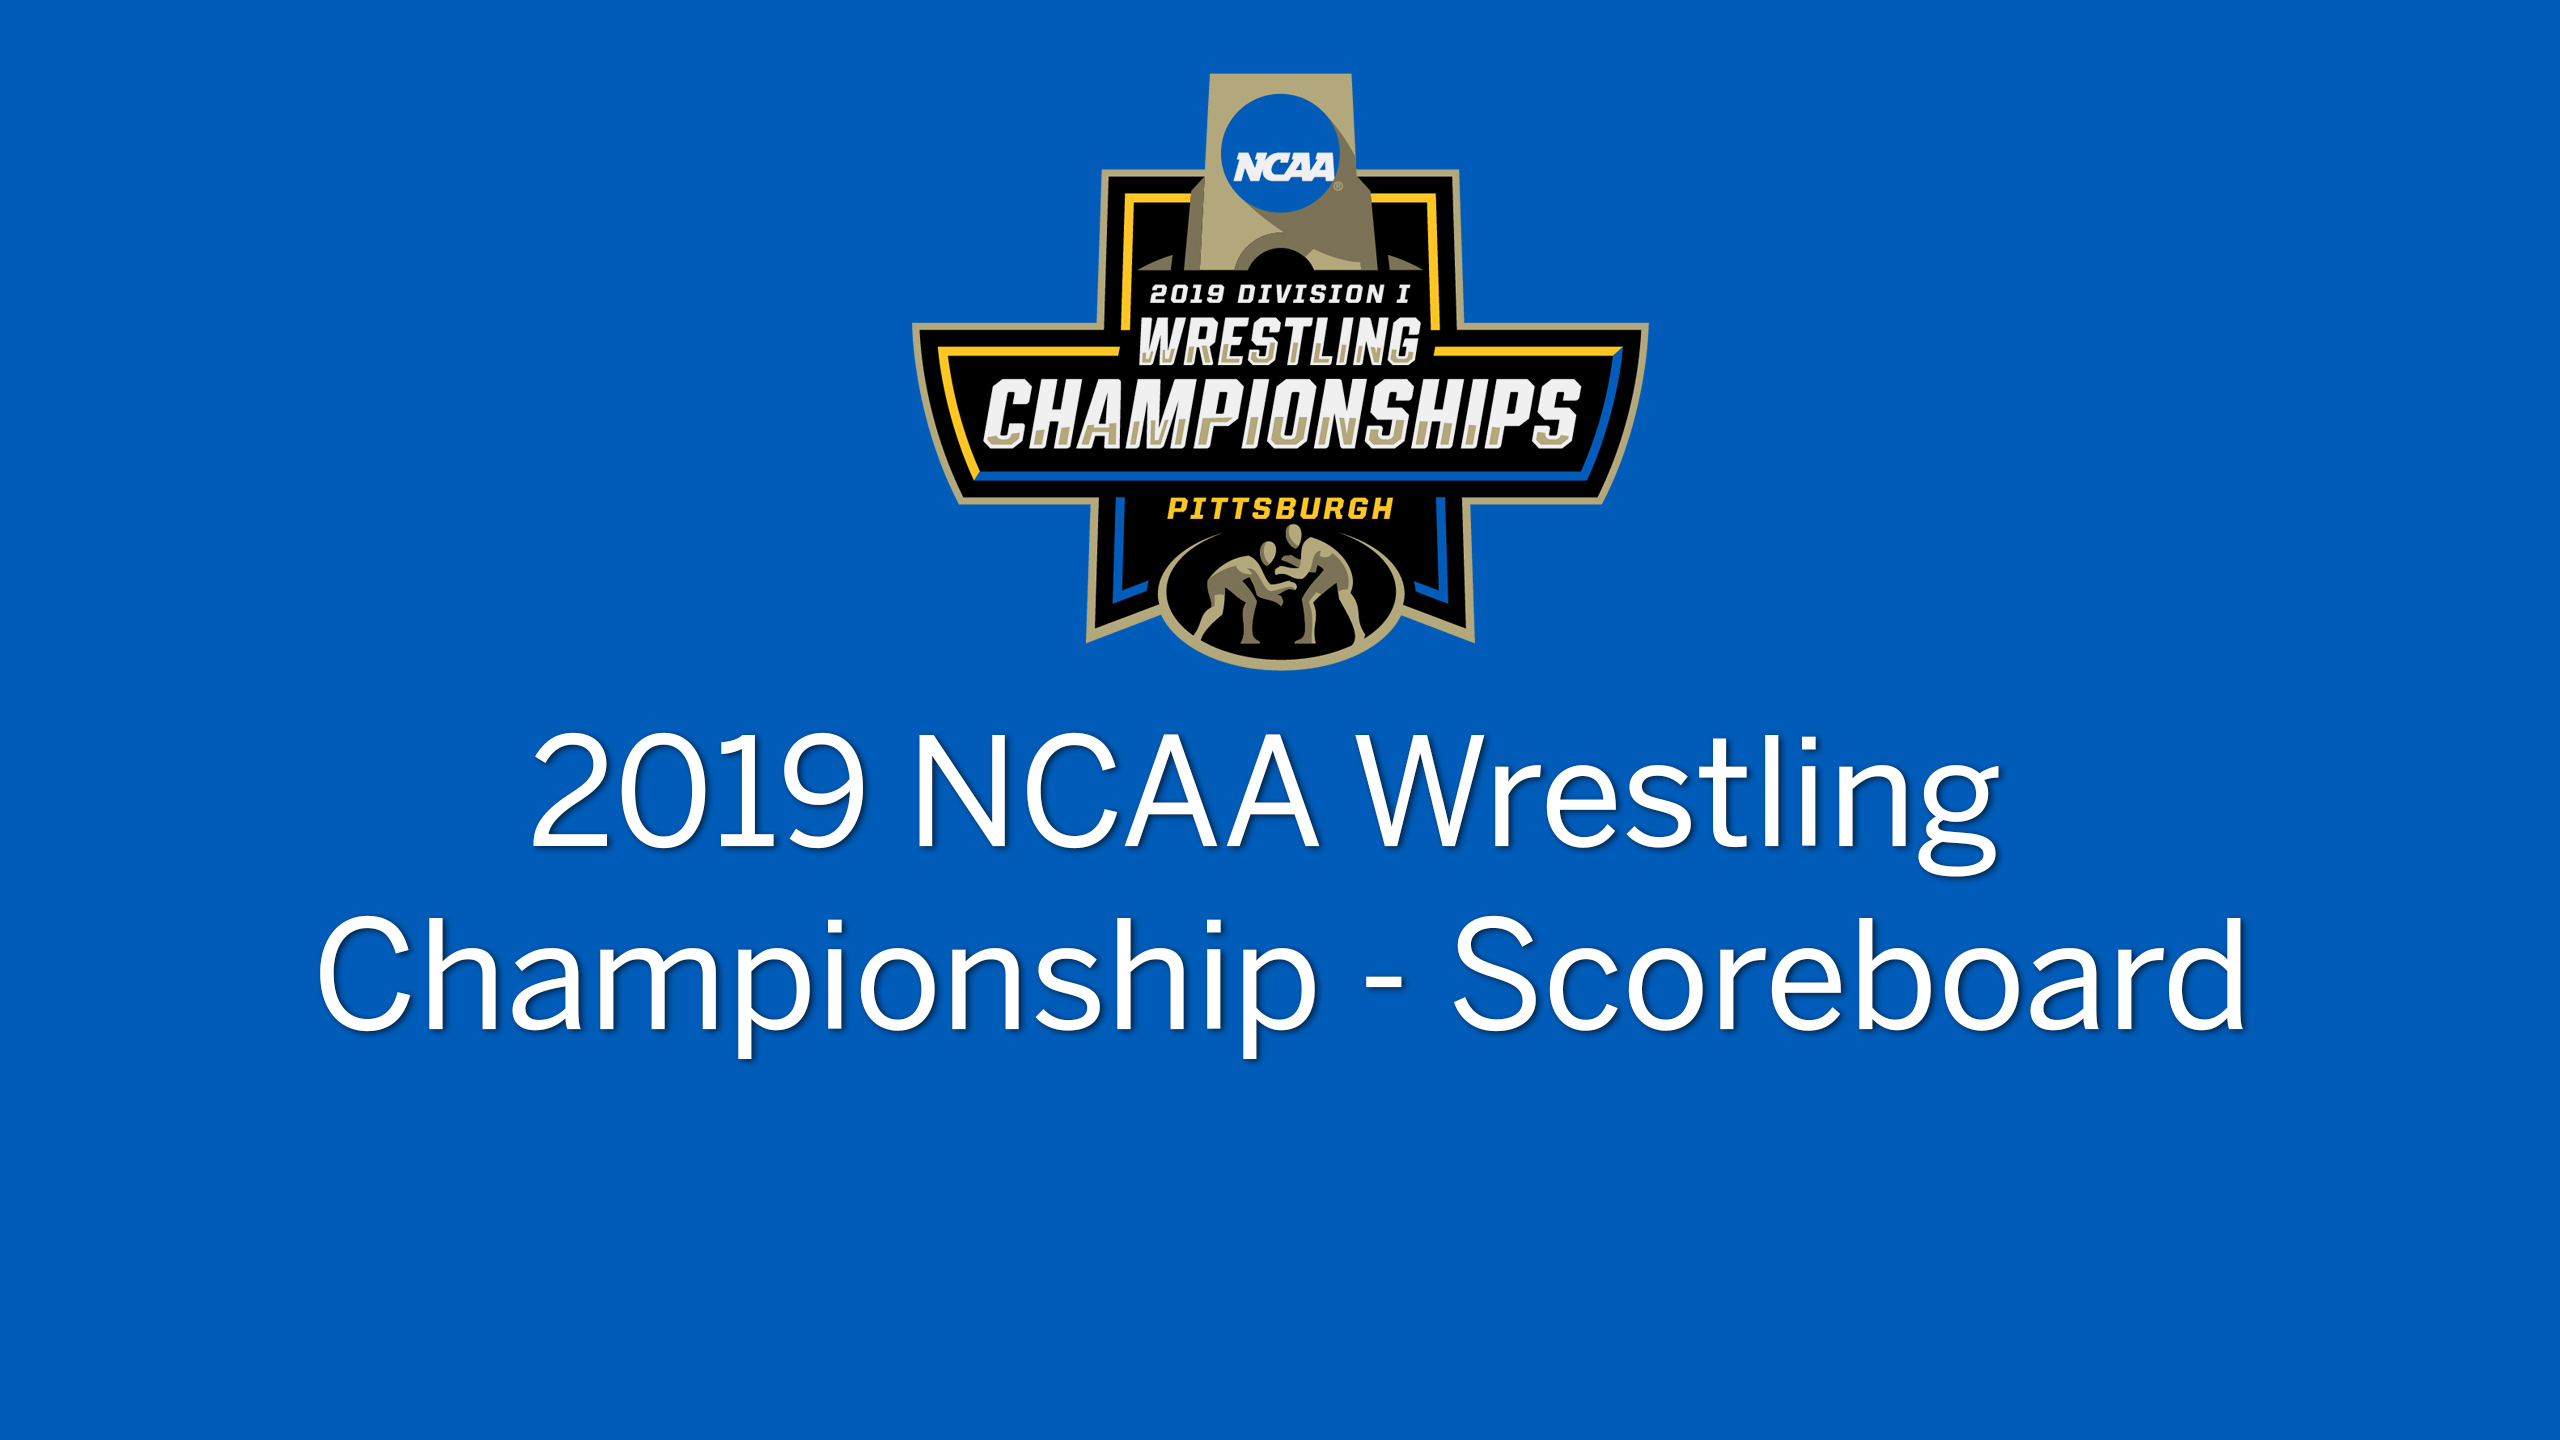 NCAA Wrestling Championship (Scoreboard - Quarterfinals)